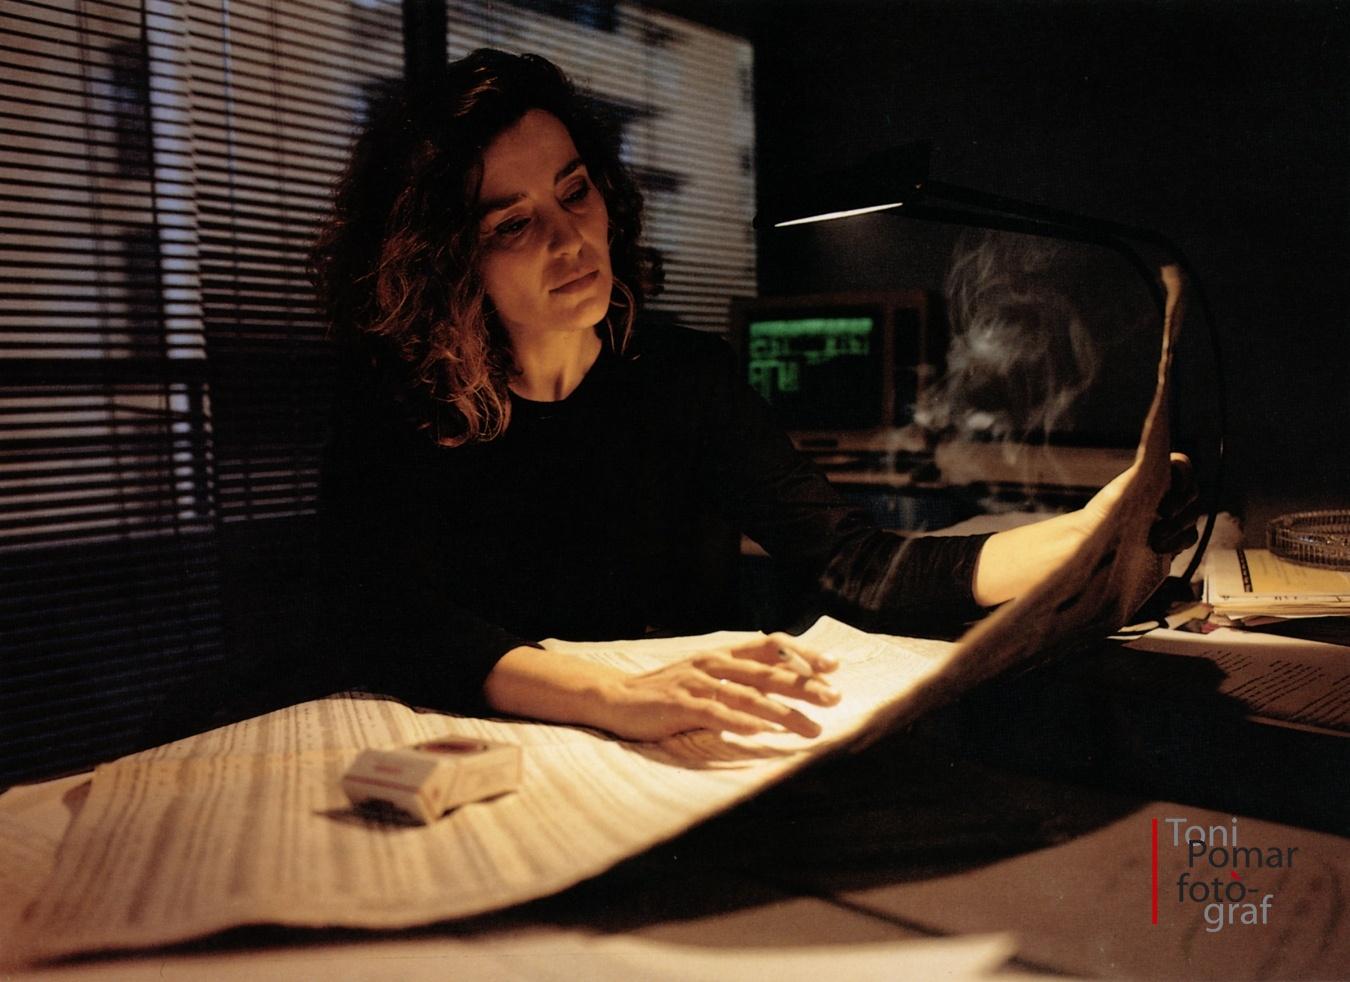 Ara, la dona de Wall Street es limita a la lectura... - Eivissa as New York - Eivissa as New York